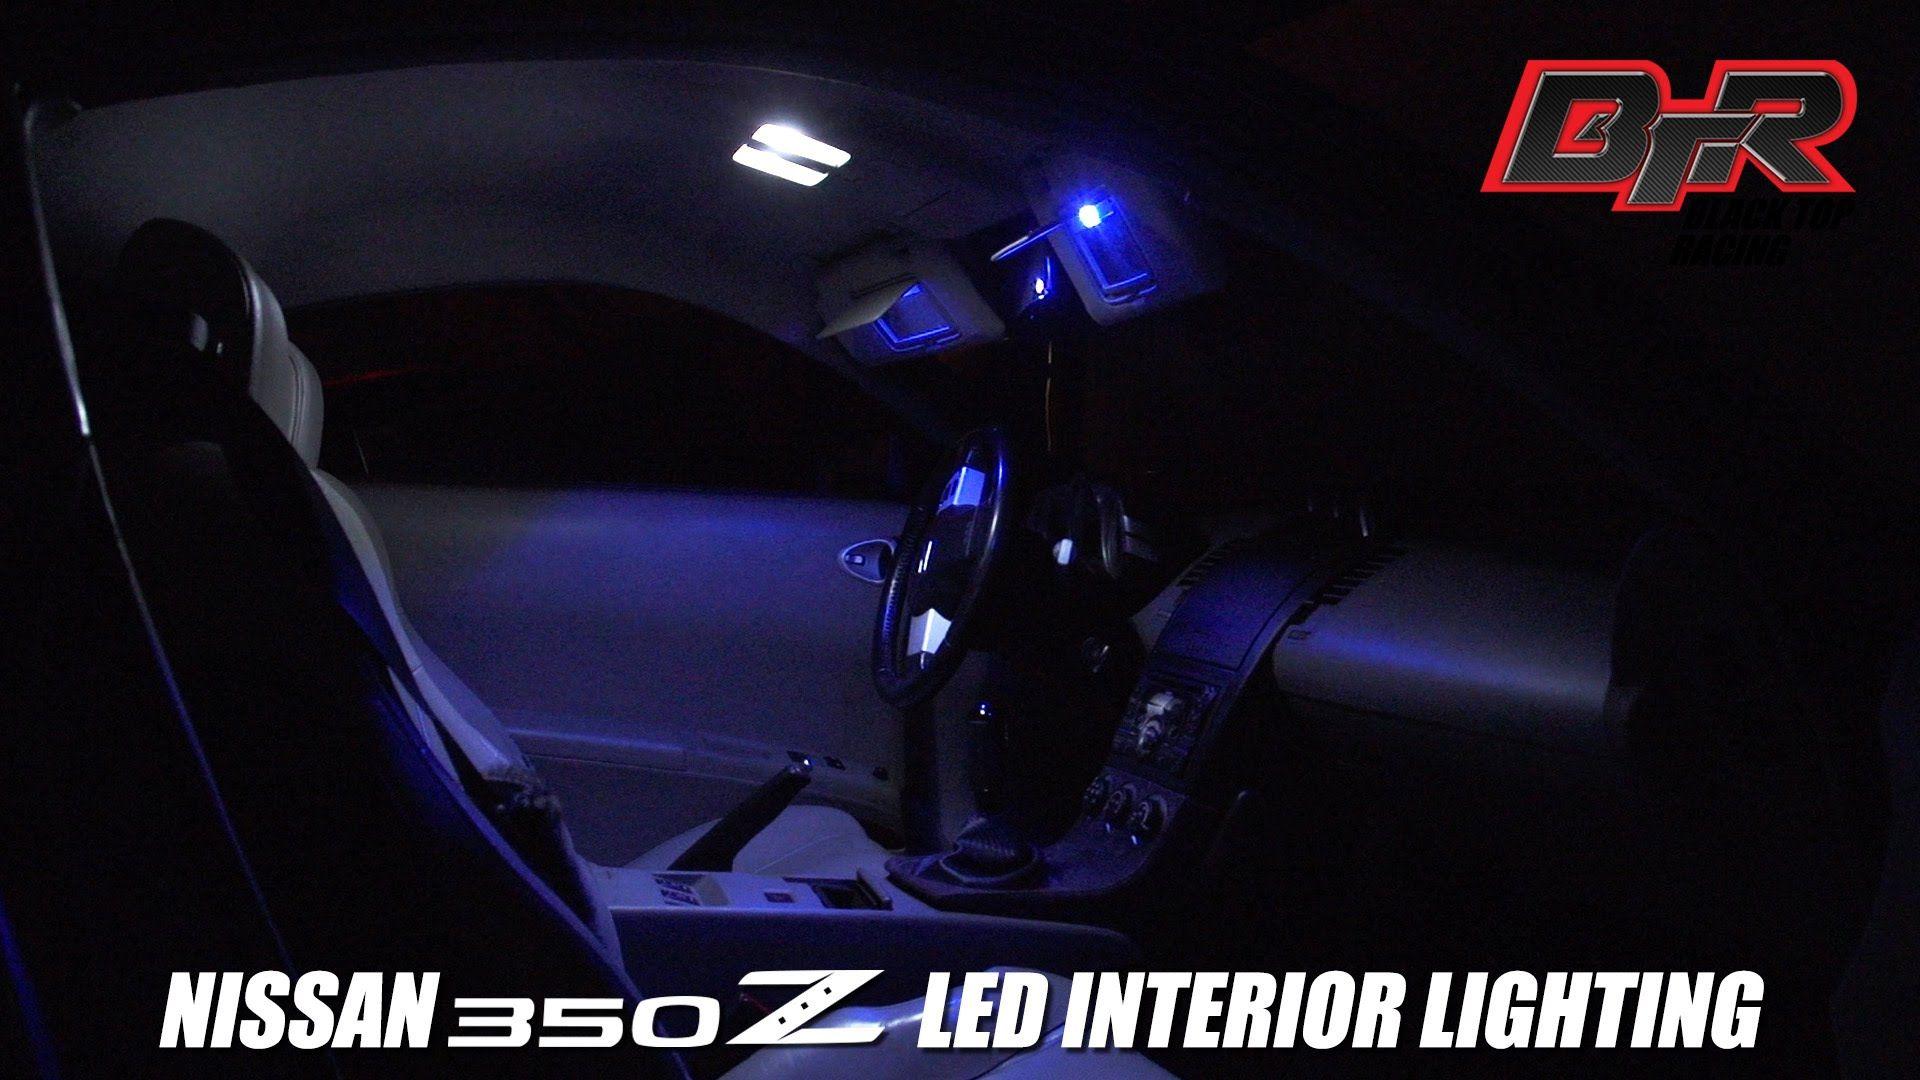 Nissan 350z Led Interior Lights Series 2 Black Top Racing You